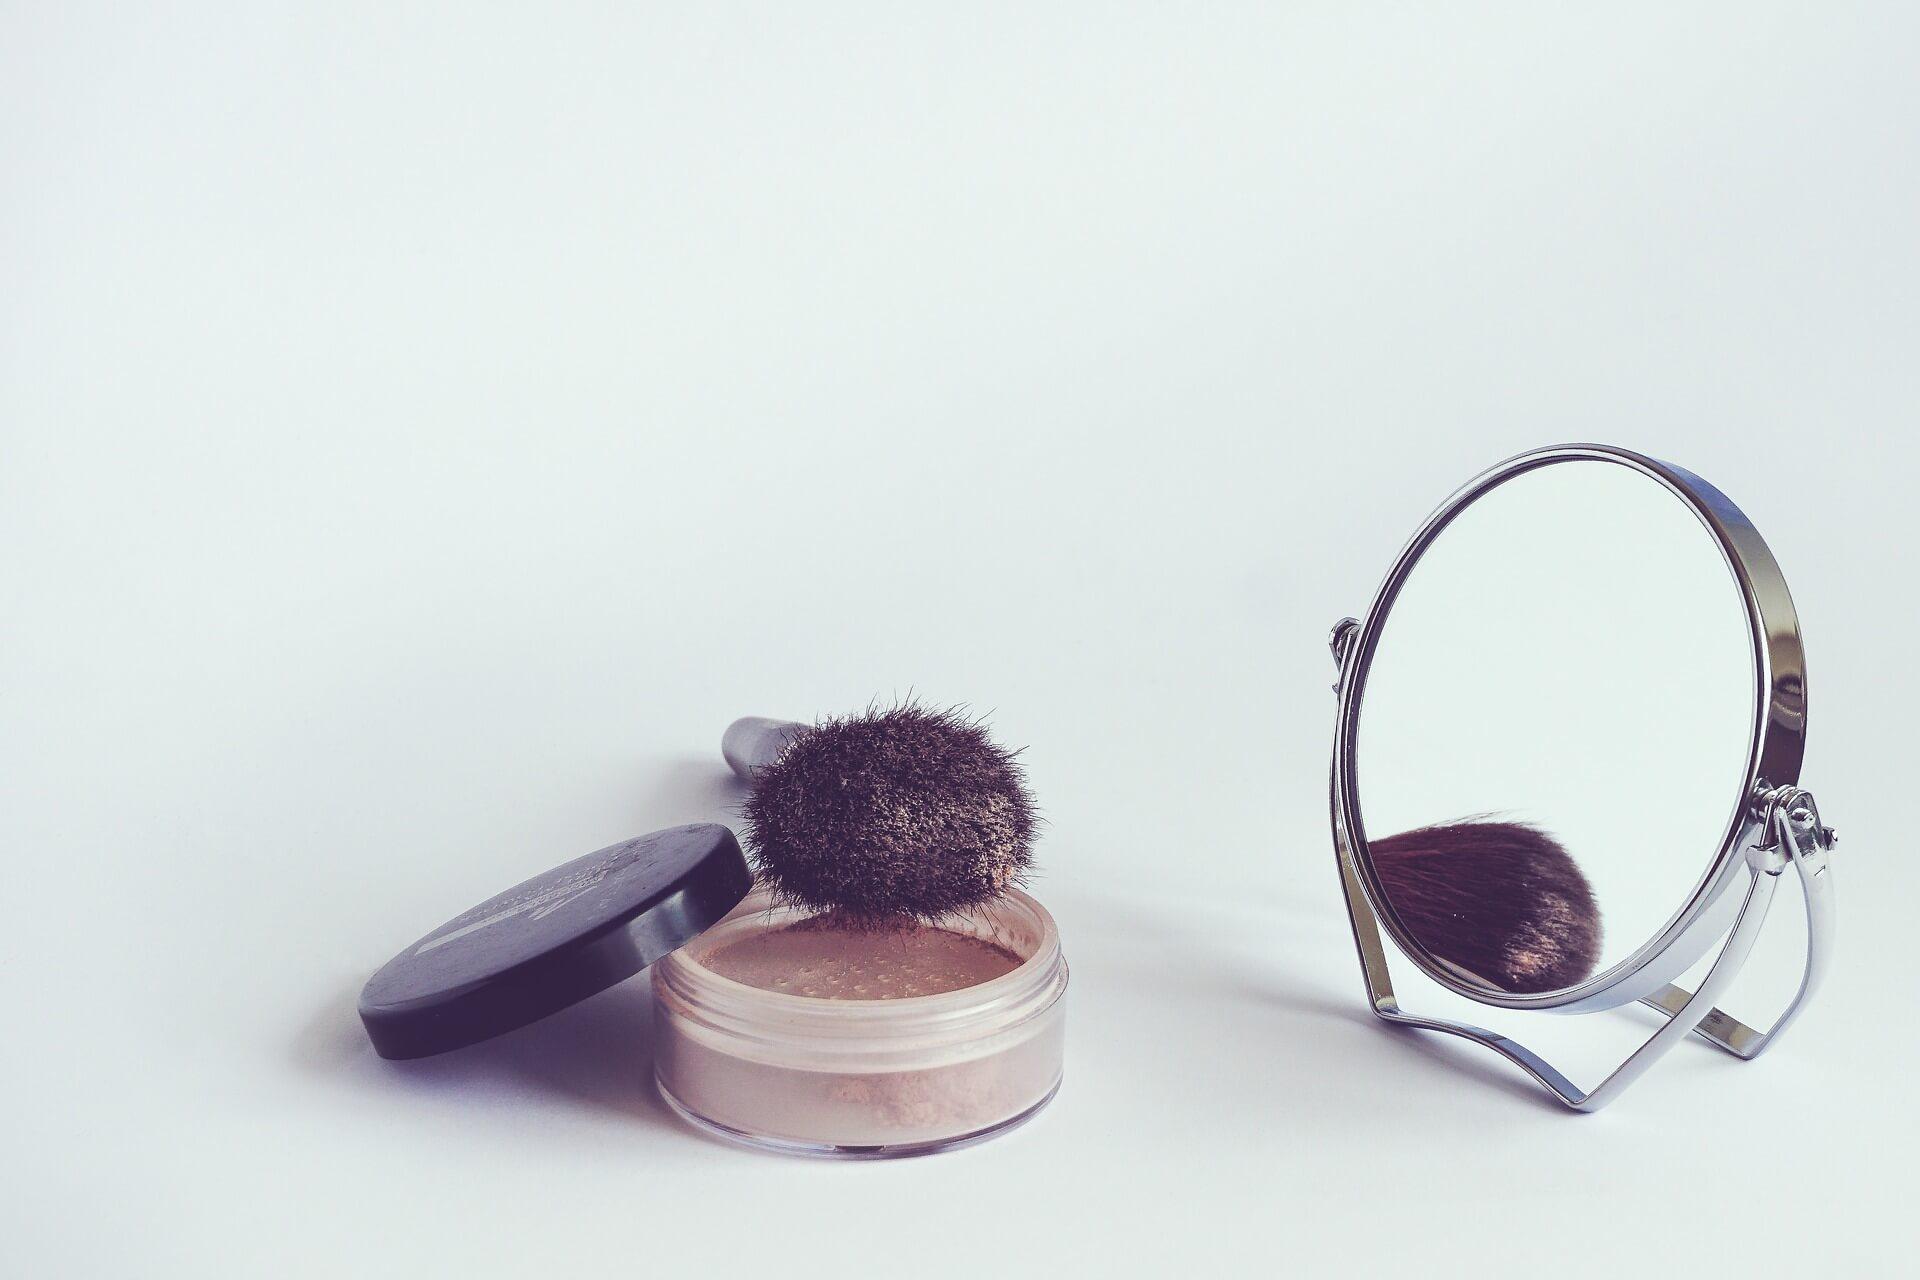 Premium Cosmetic Kits